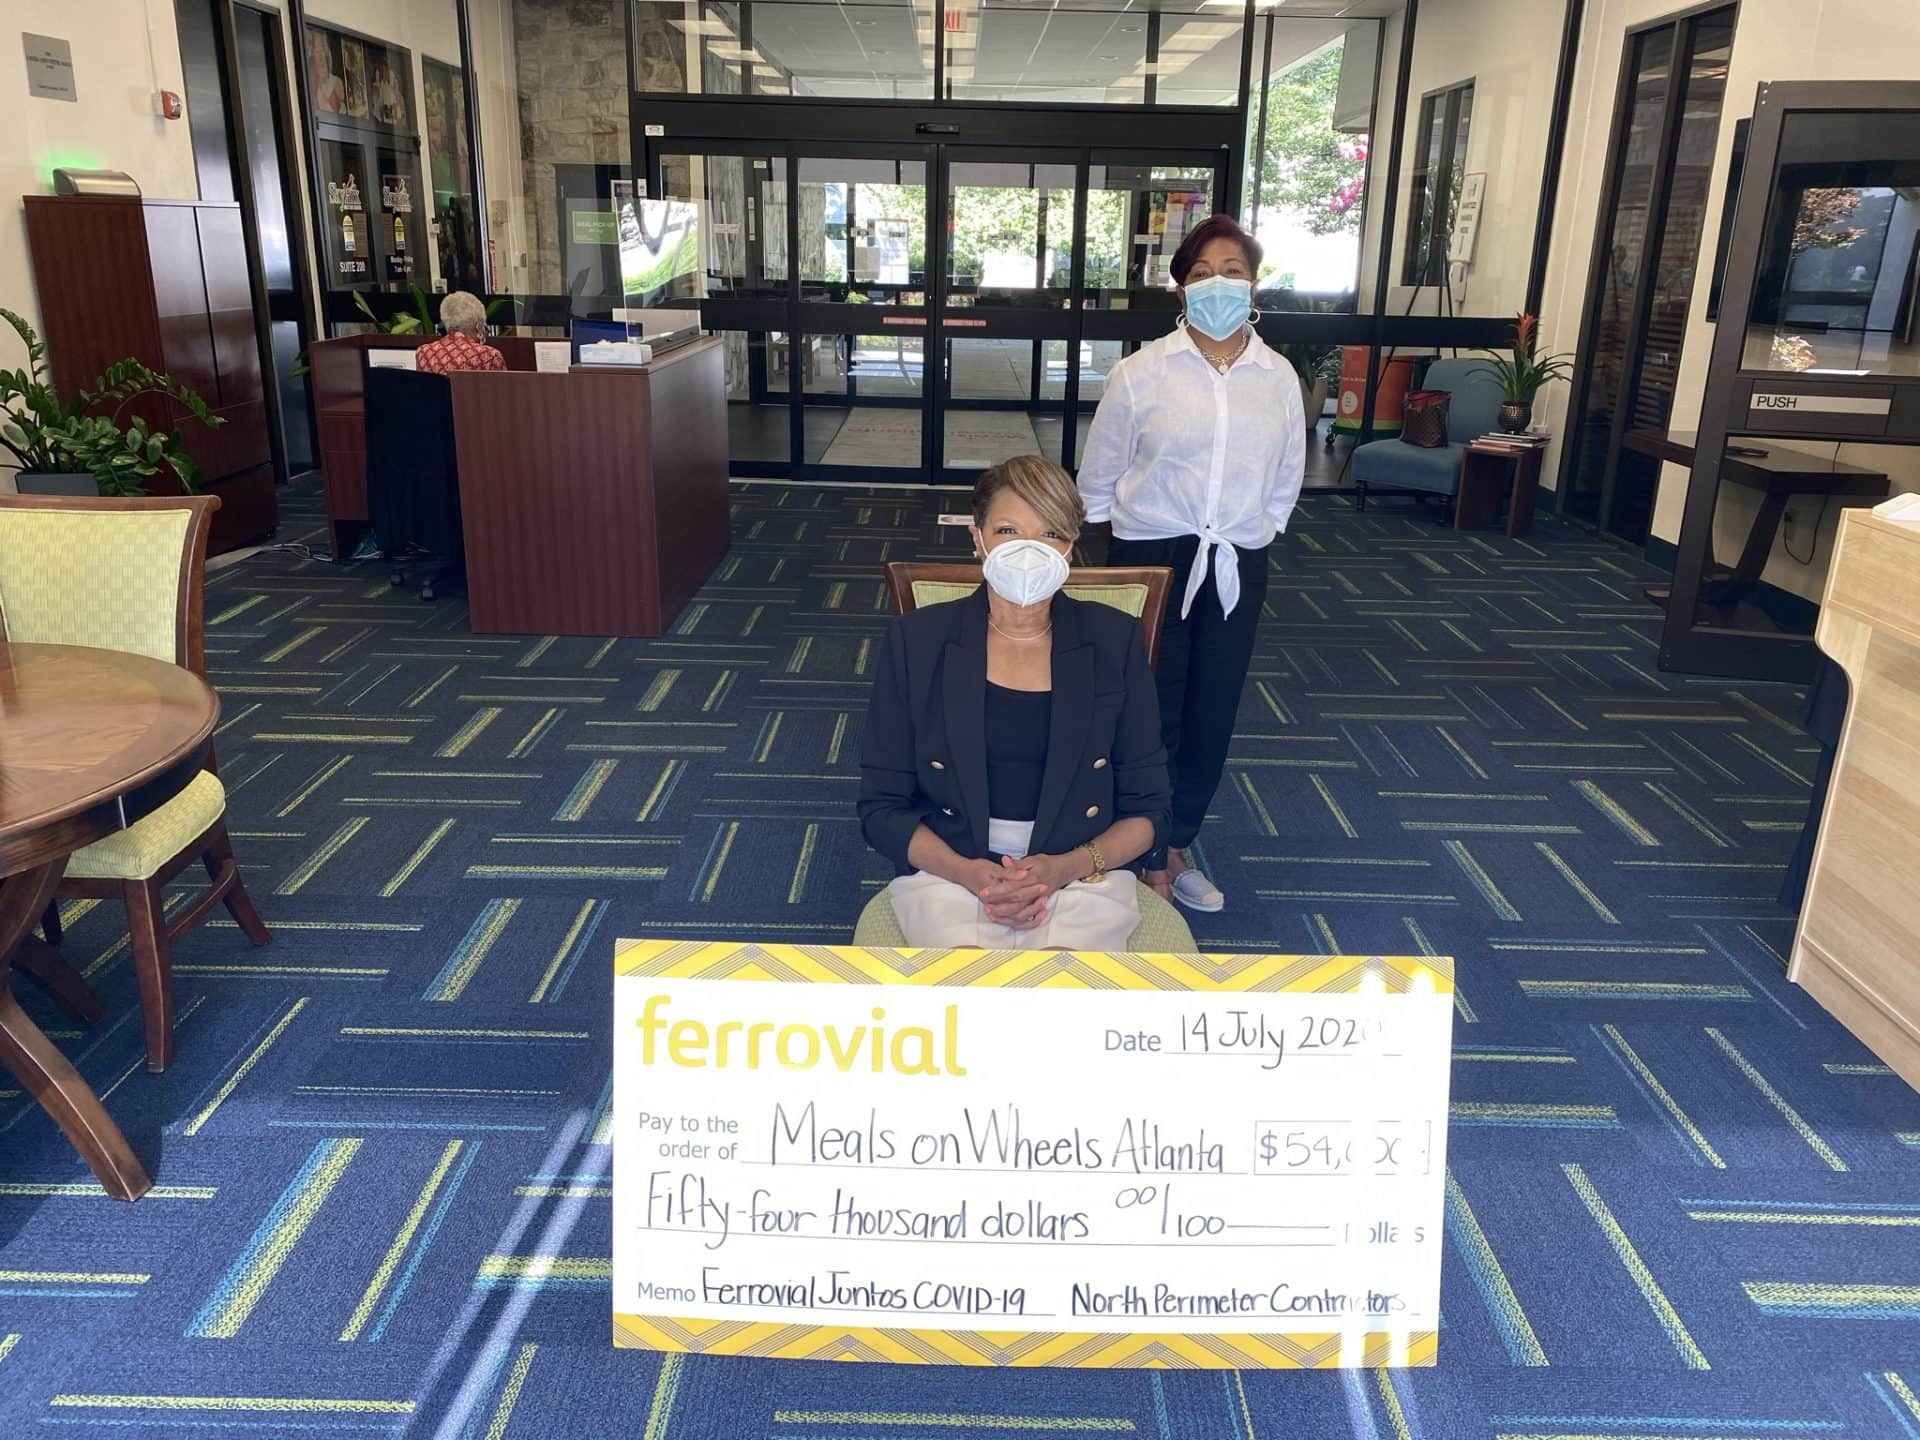 Covid19 fund Meals on Wheels Atlanta US